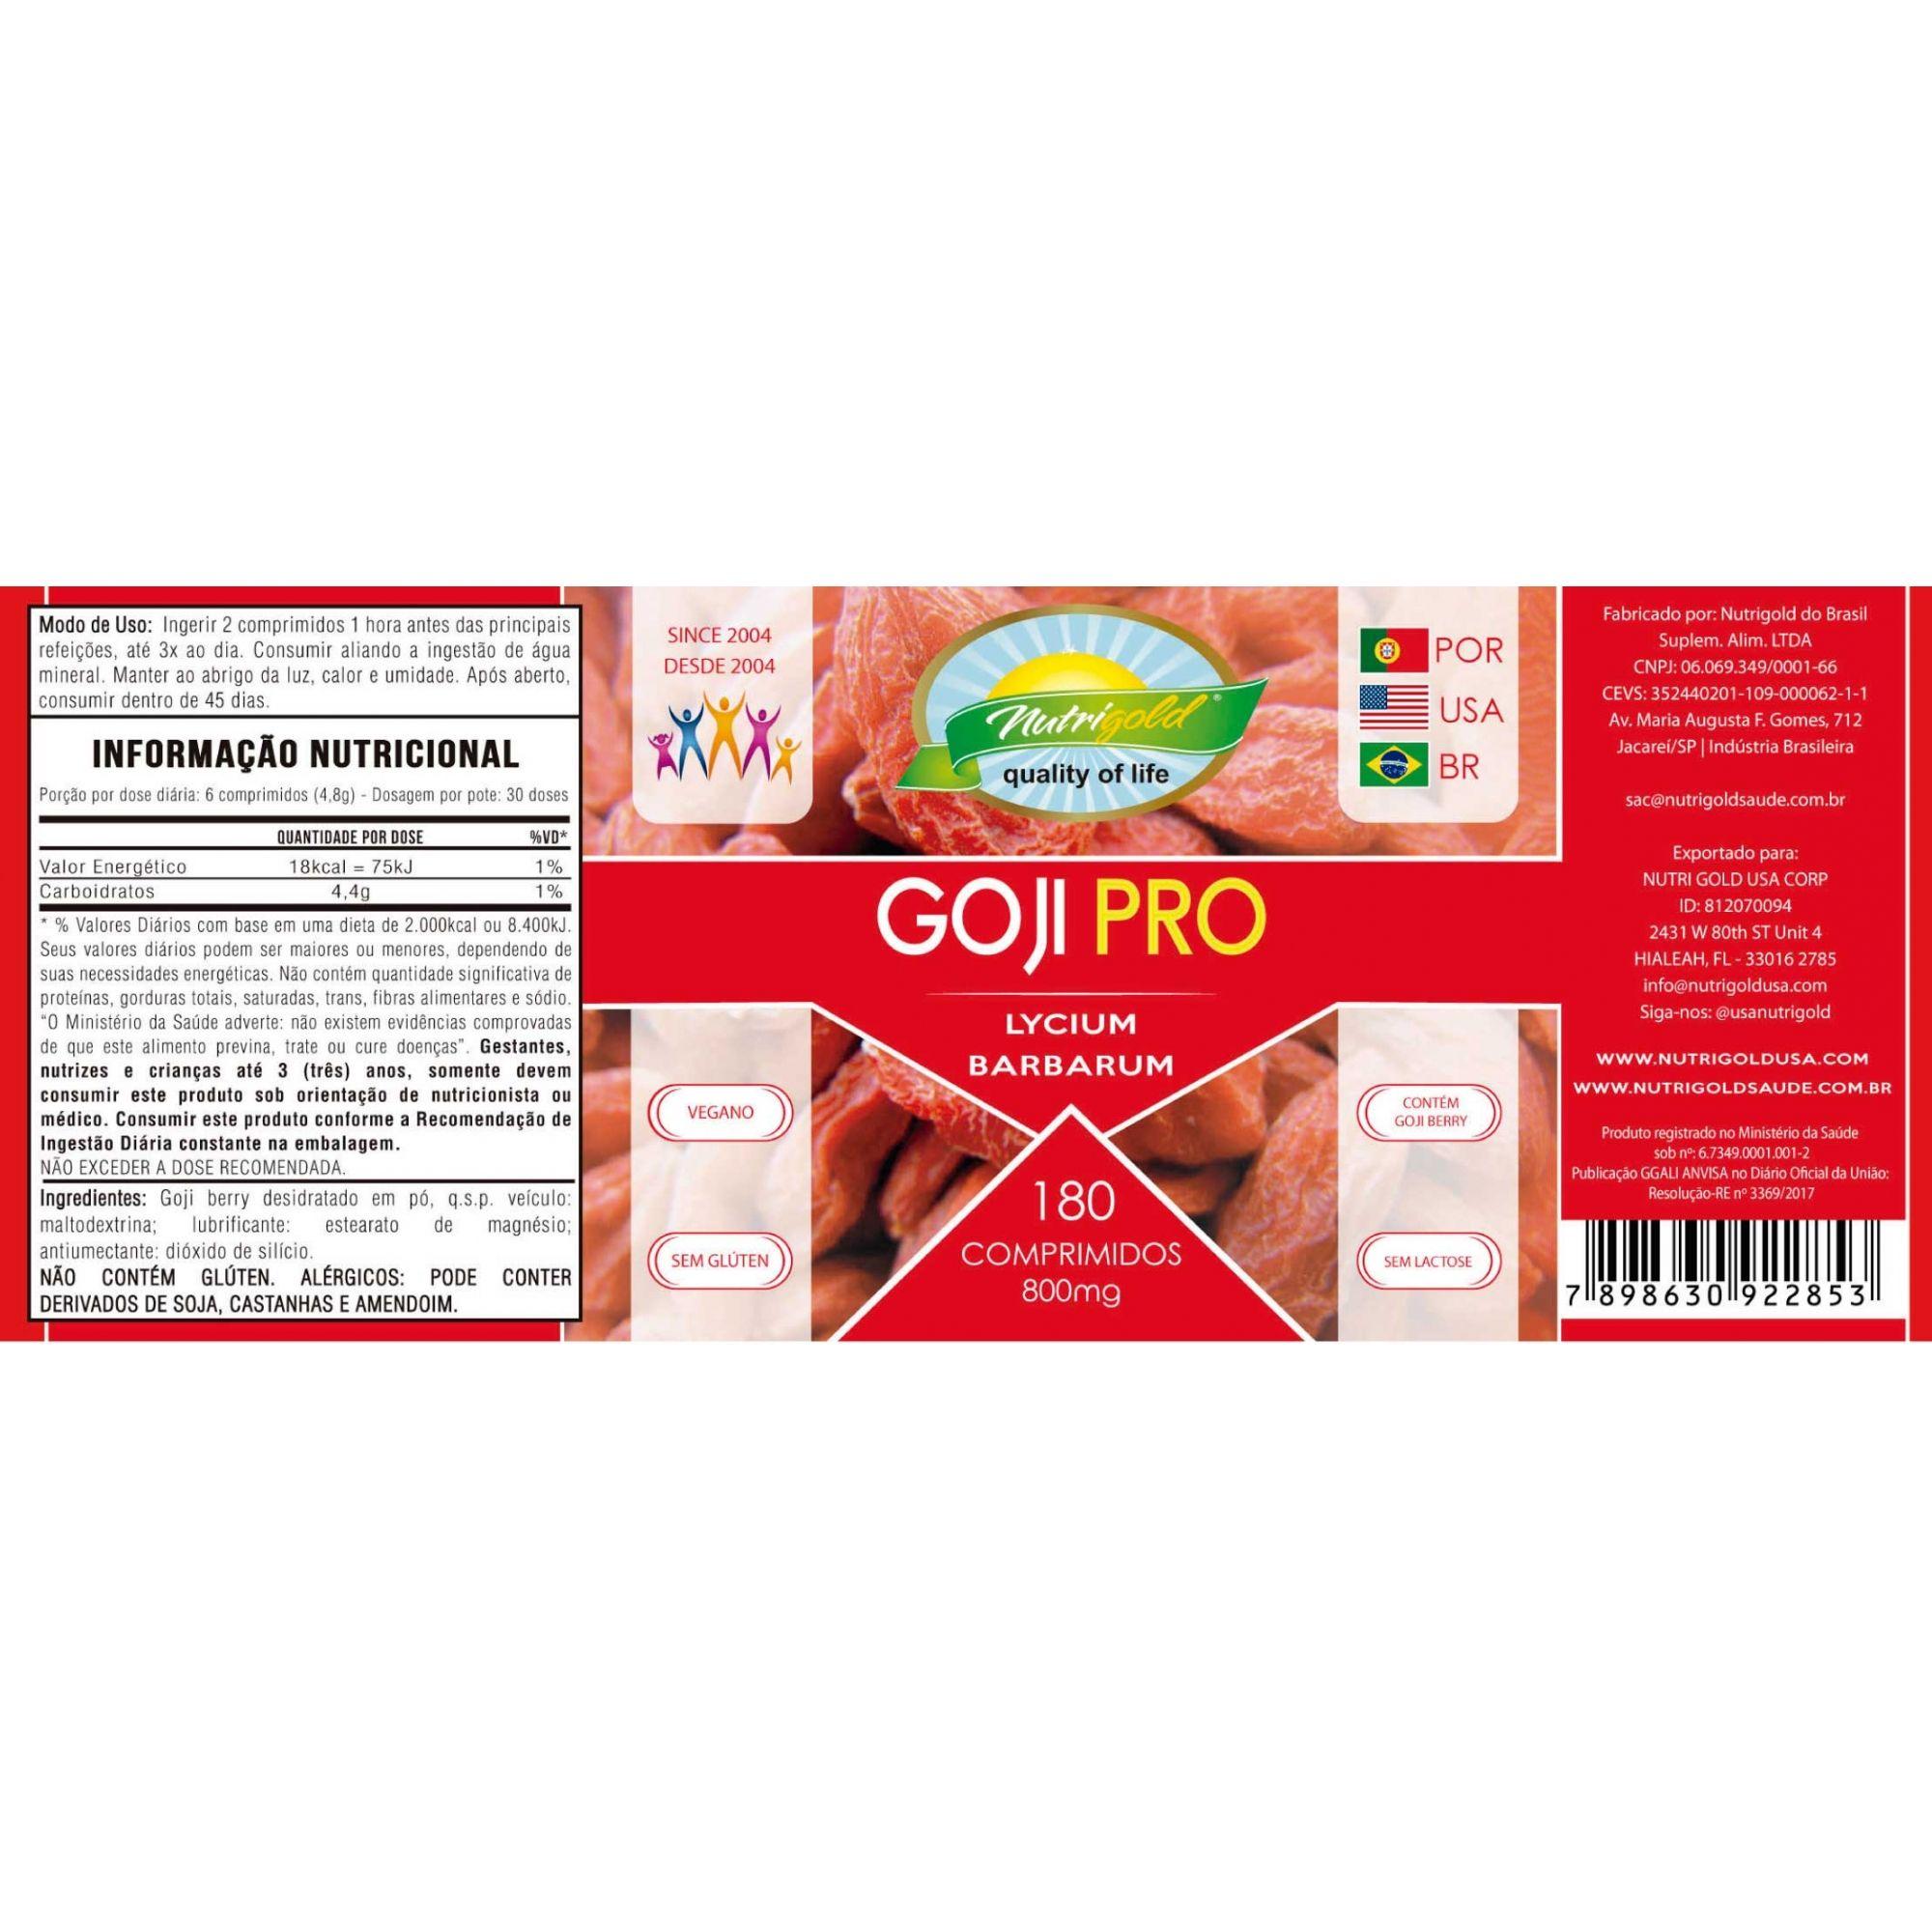 Kit 6 Goji Pro Pote 180 Comprimidos 800mg